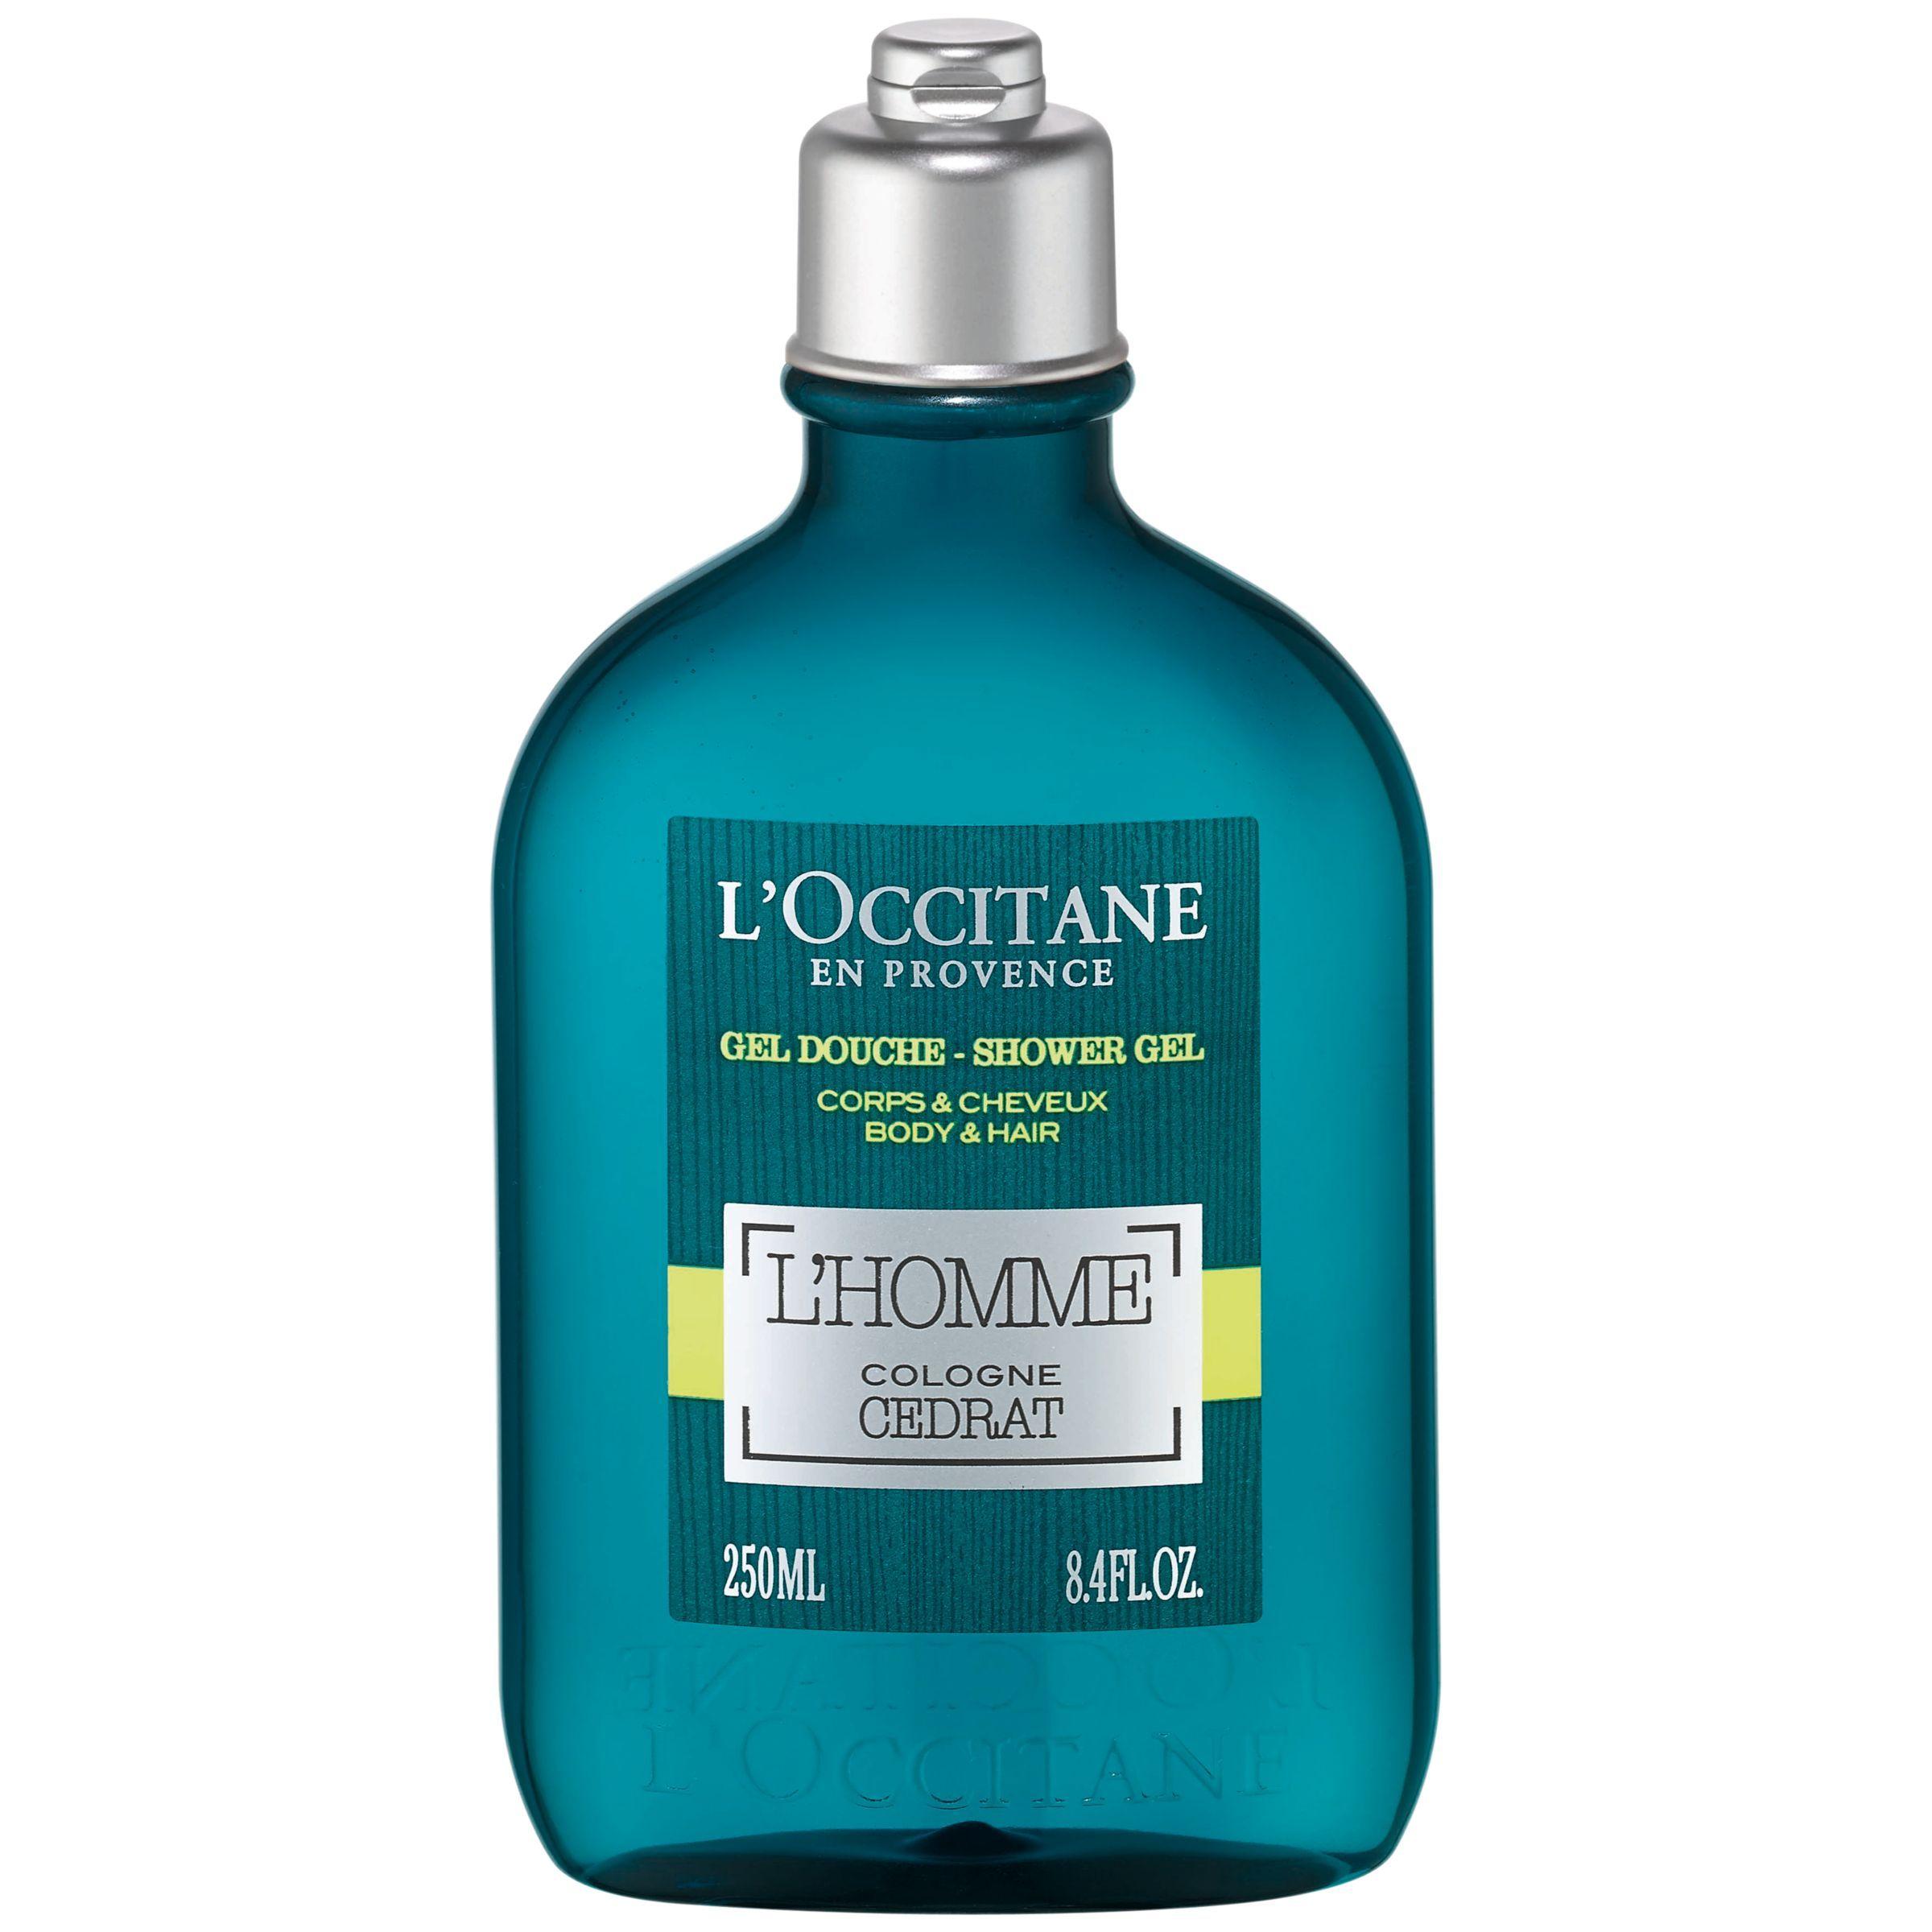 L'Occitane L'Homme Cologne Cedrat Shower Gel, 250ml